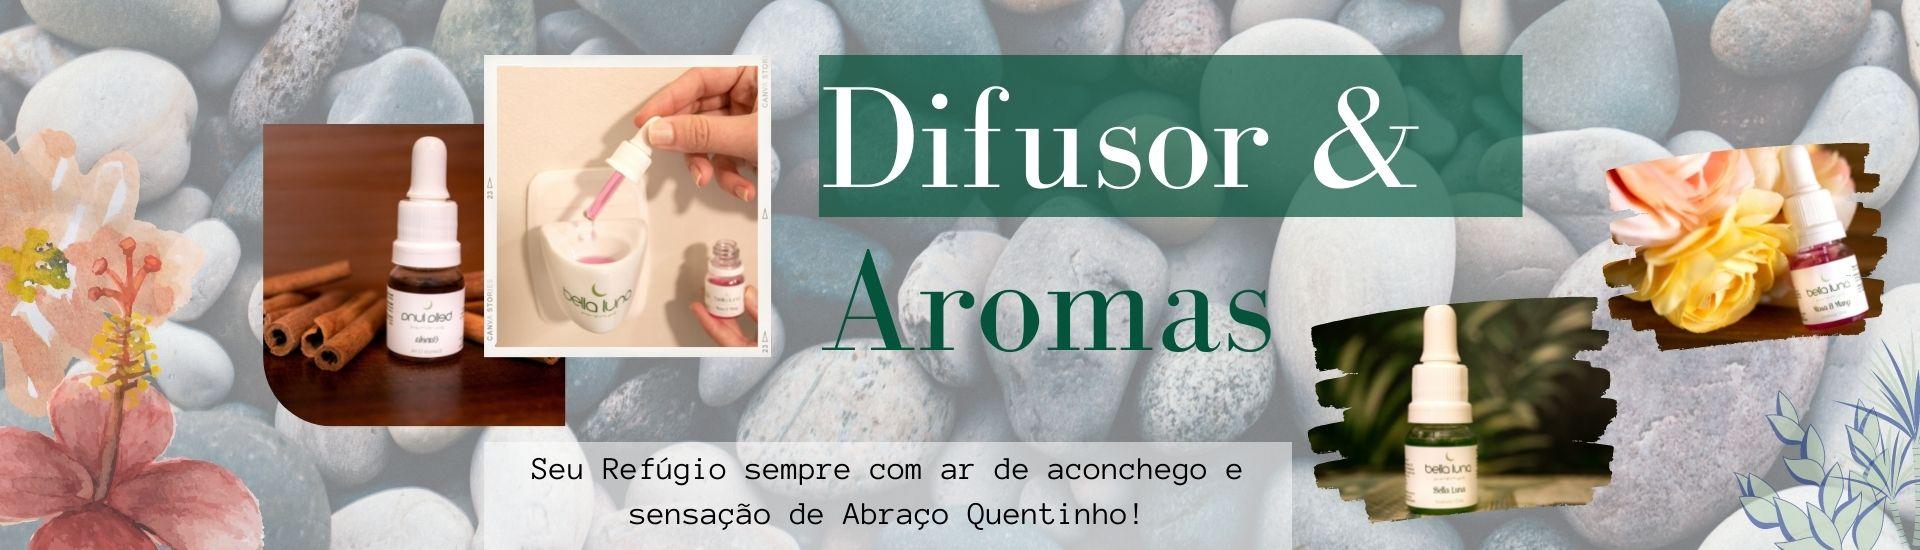 Difusor de AROMAS.jpg